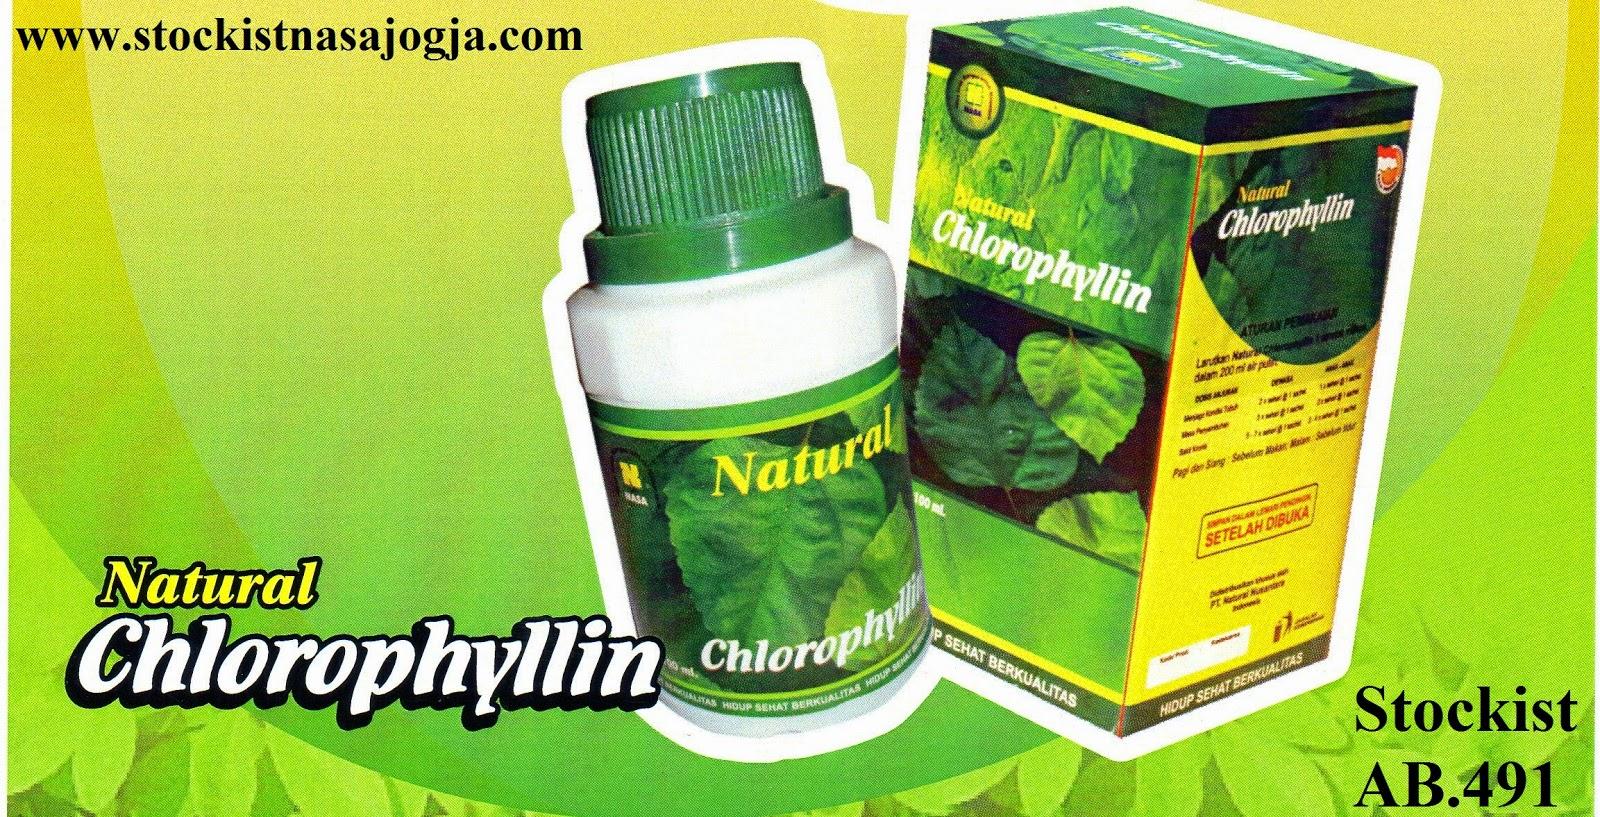 http://www.stockistnasajogja.com/2015/03/natural-chlorophyllin-kemasan-terbaru.html